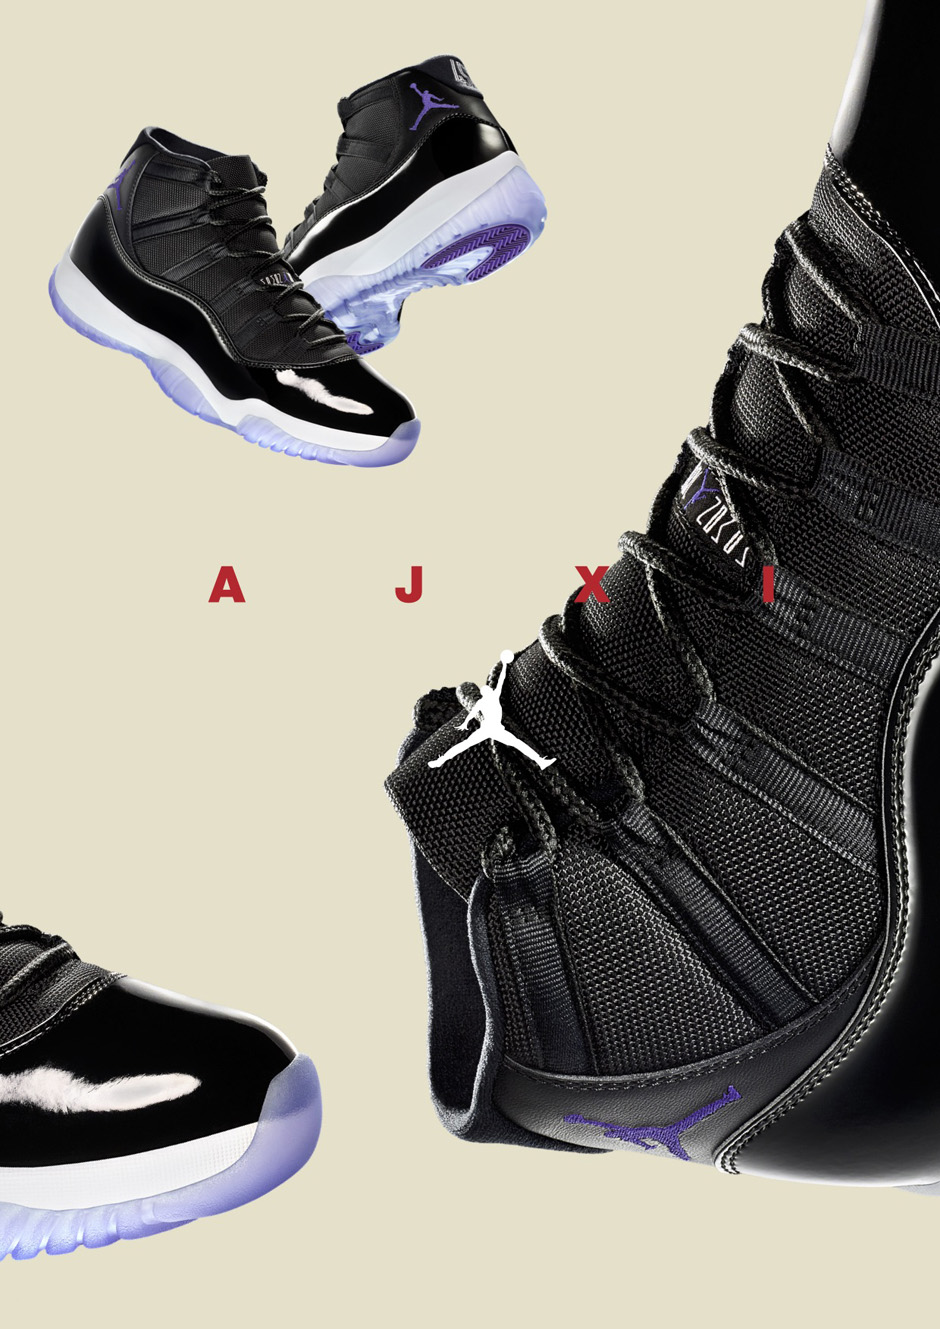 Jordan sneakers release dates in Australia